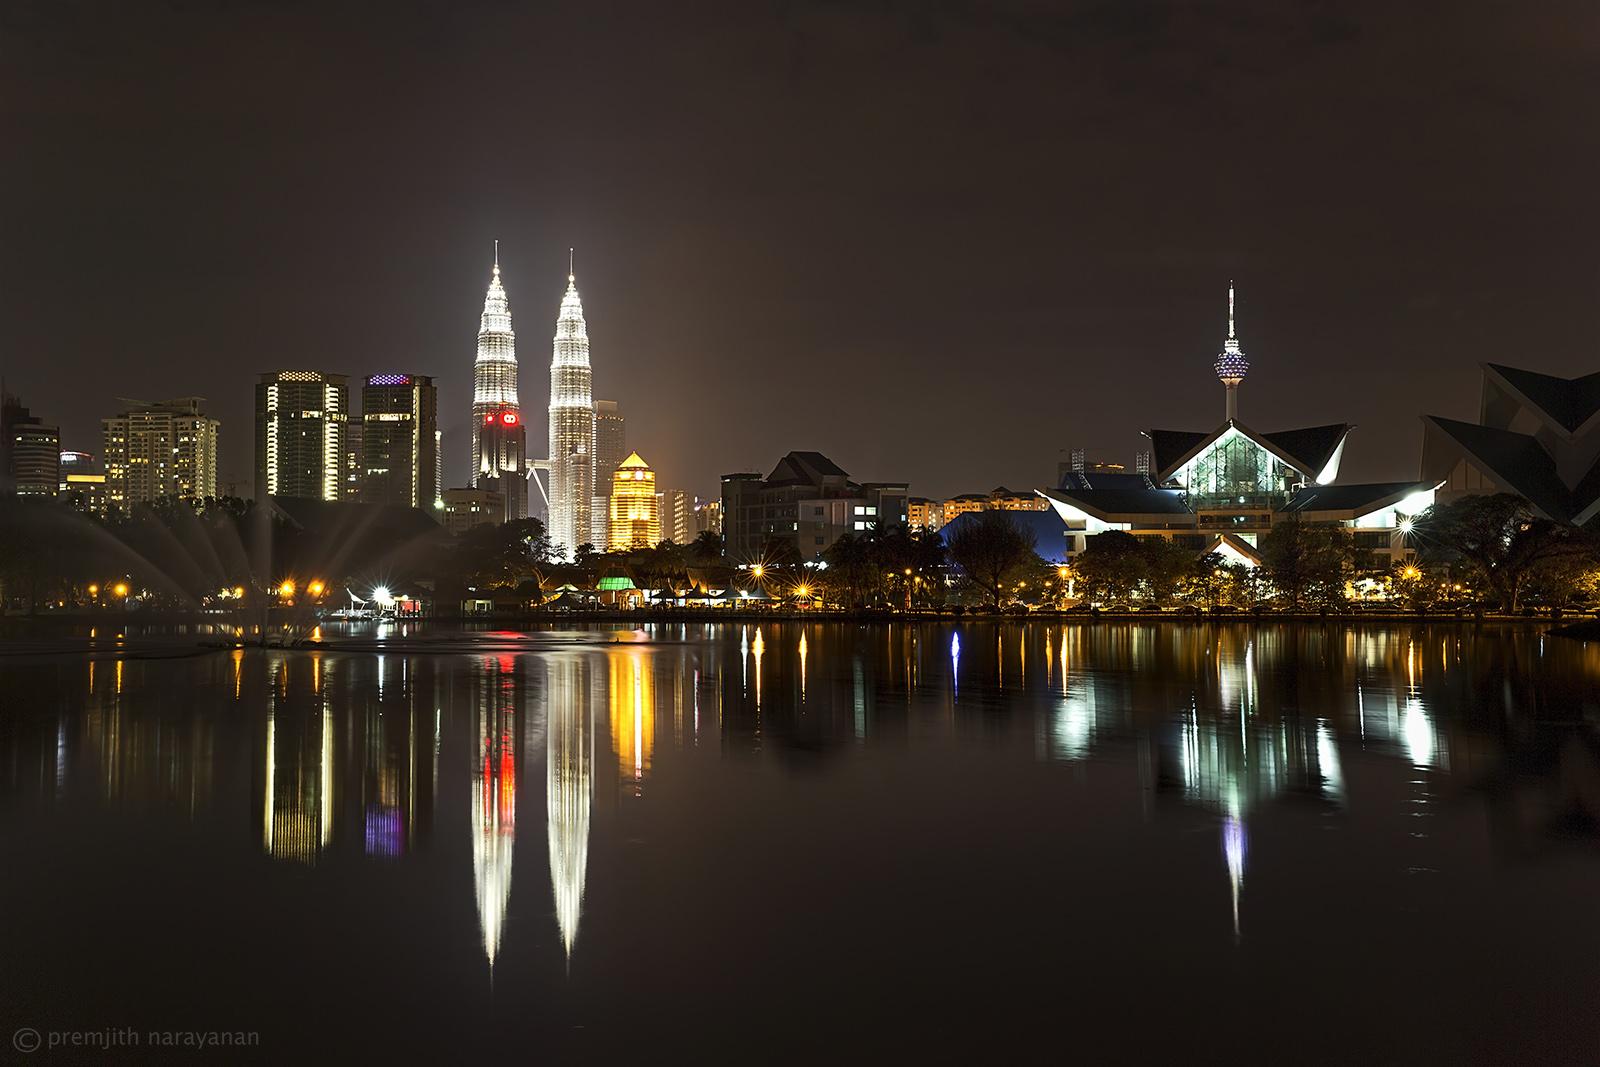 Petronas & Kuala Lumpur Towers